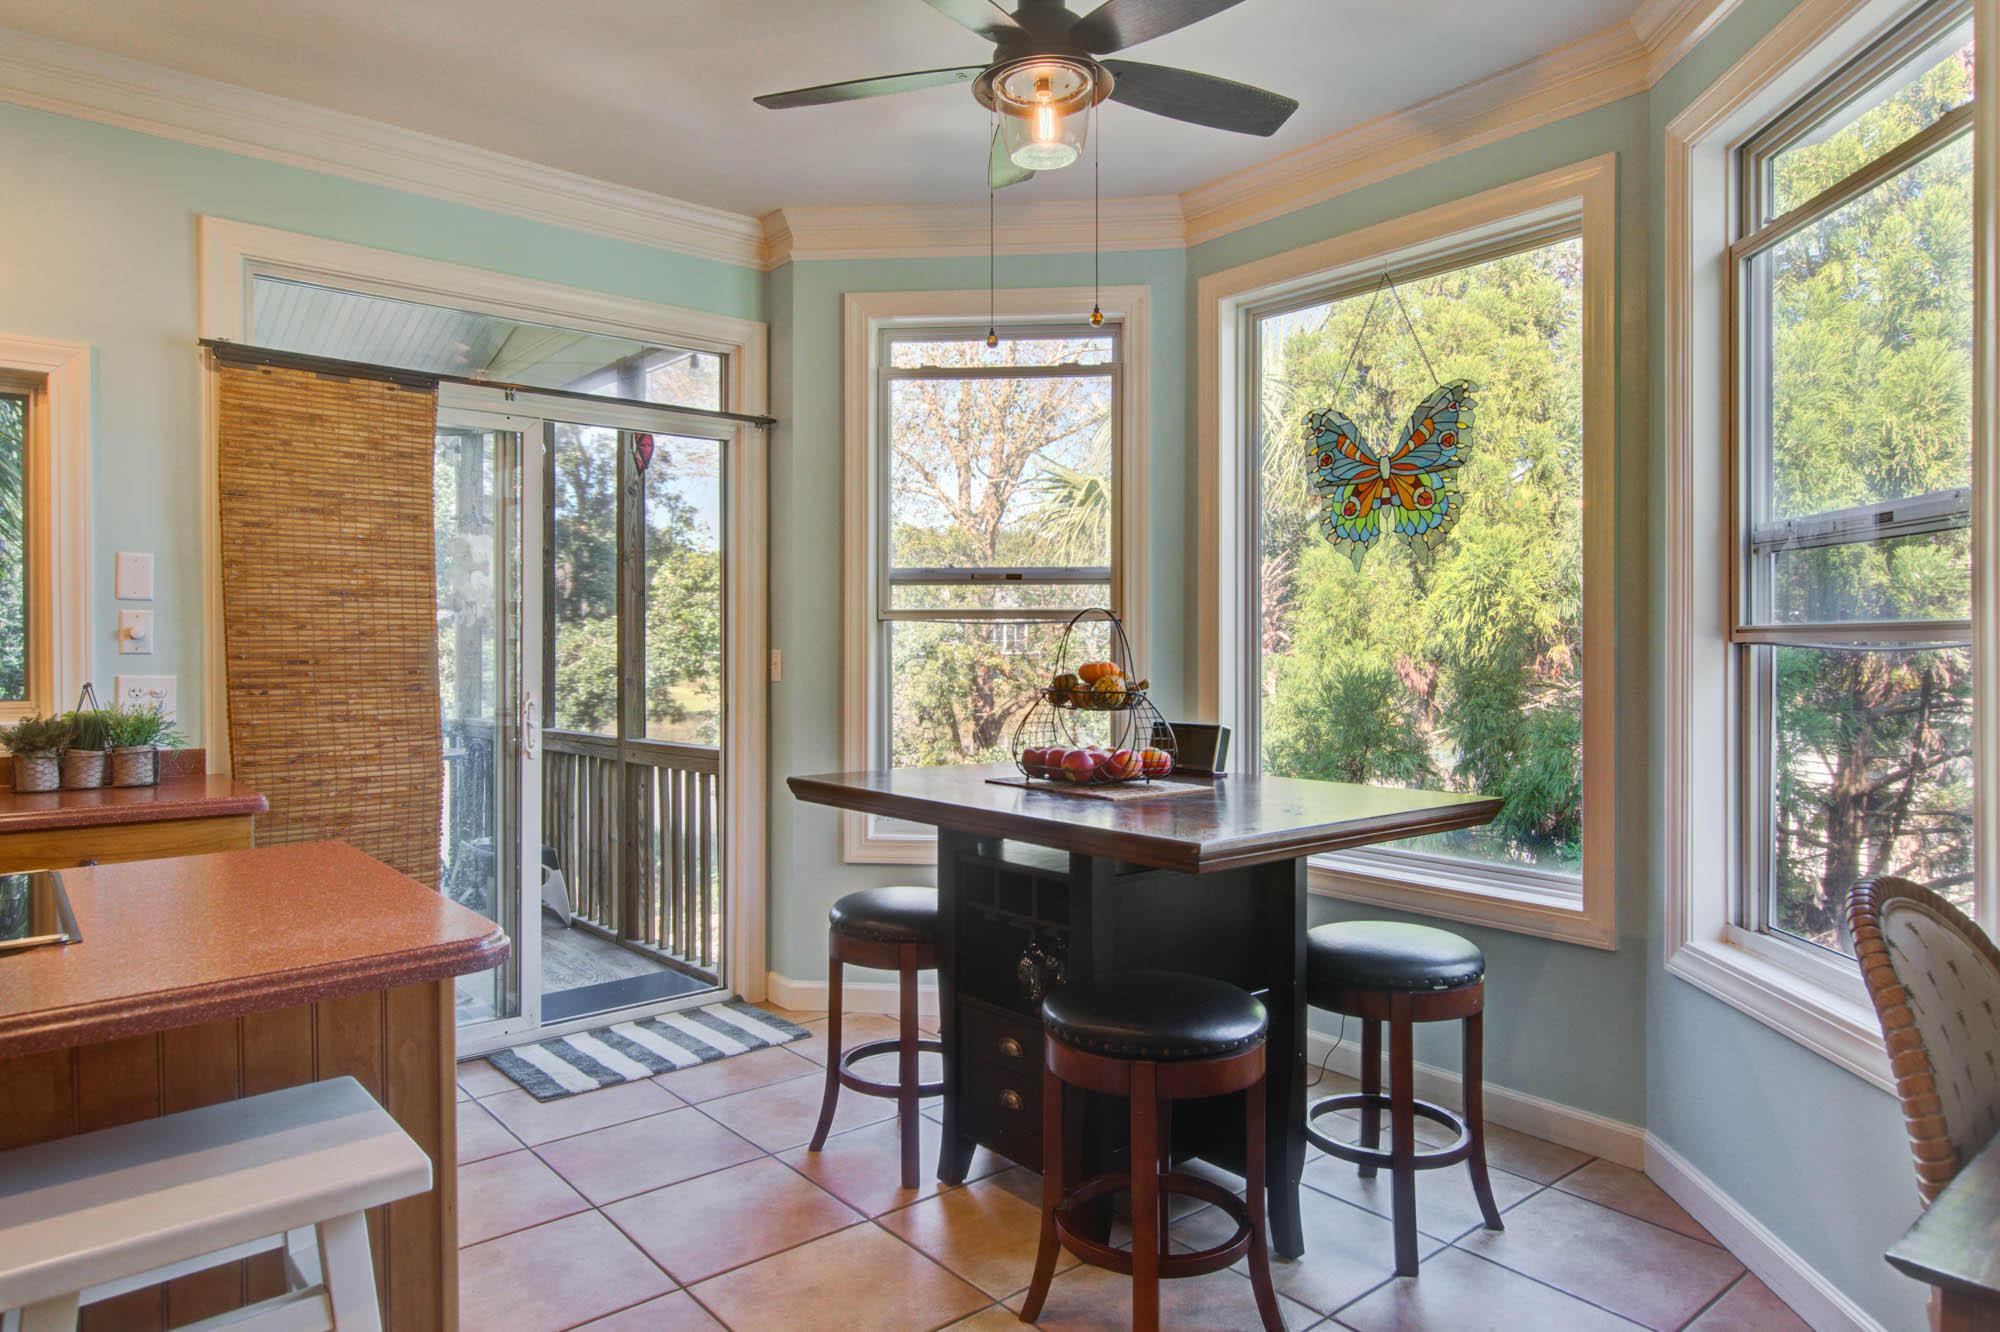 St Thomas Point Homes For Sale - 307 Jamesbury, Charleston, SC - 31